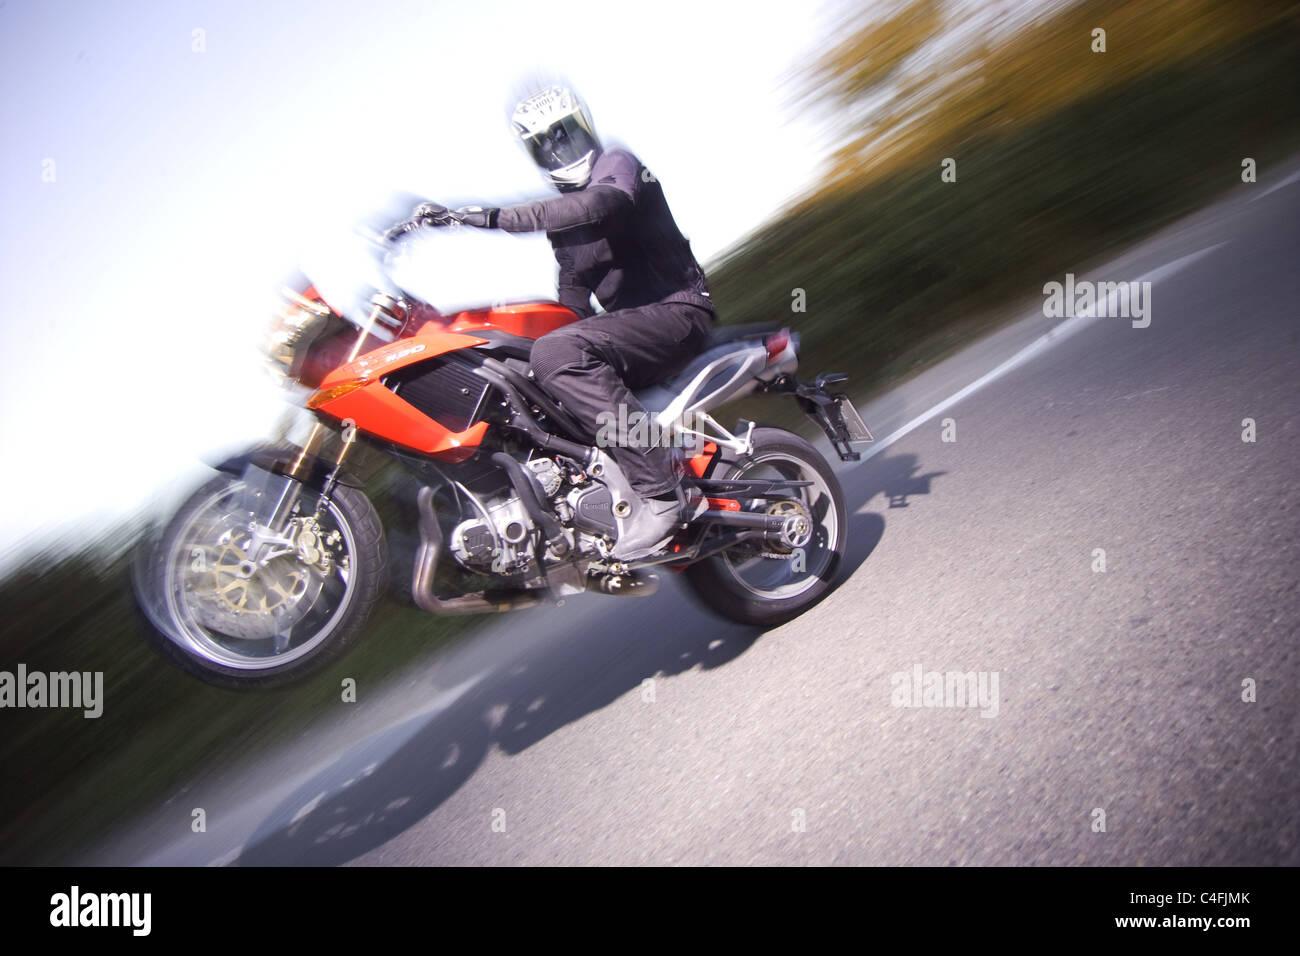 Biker - Stock Image